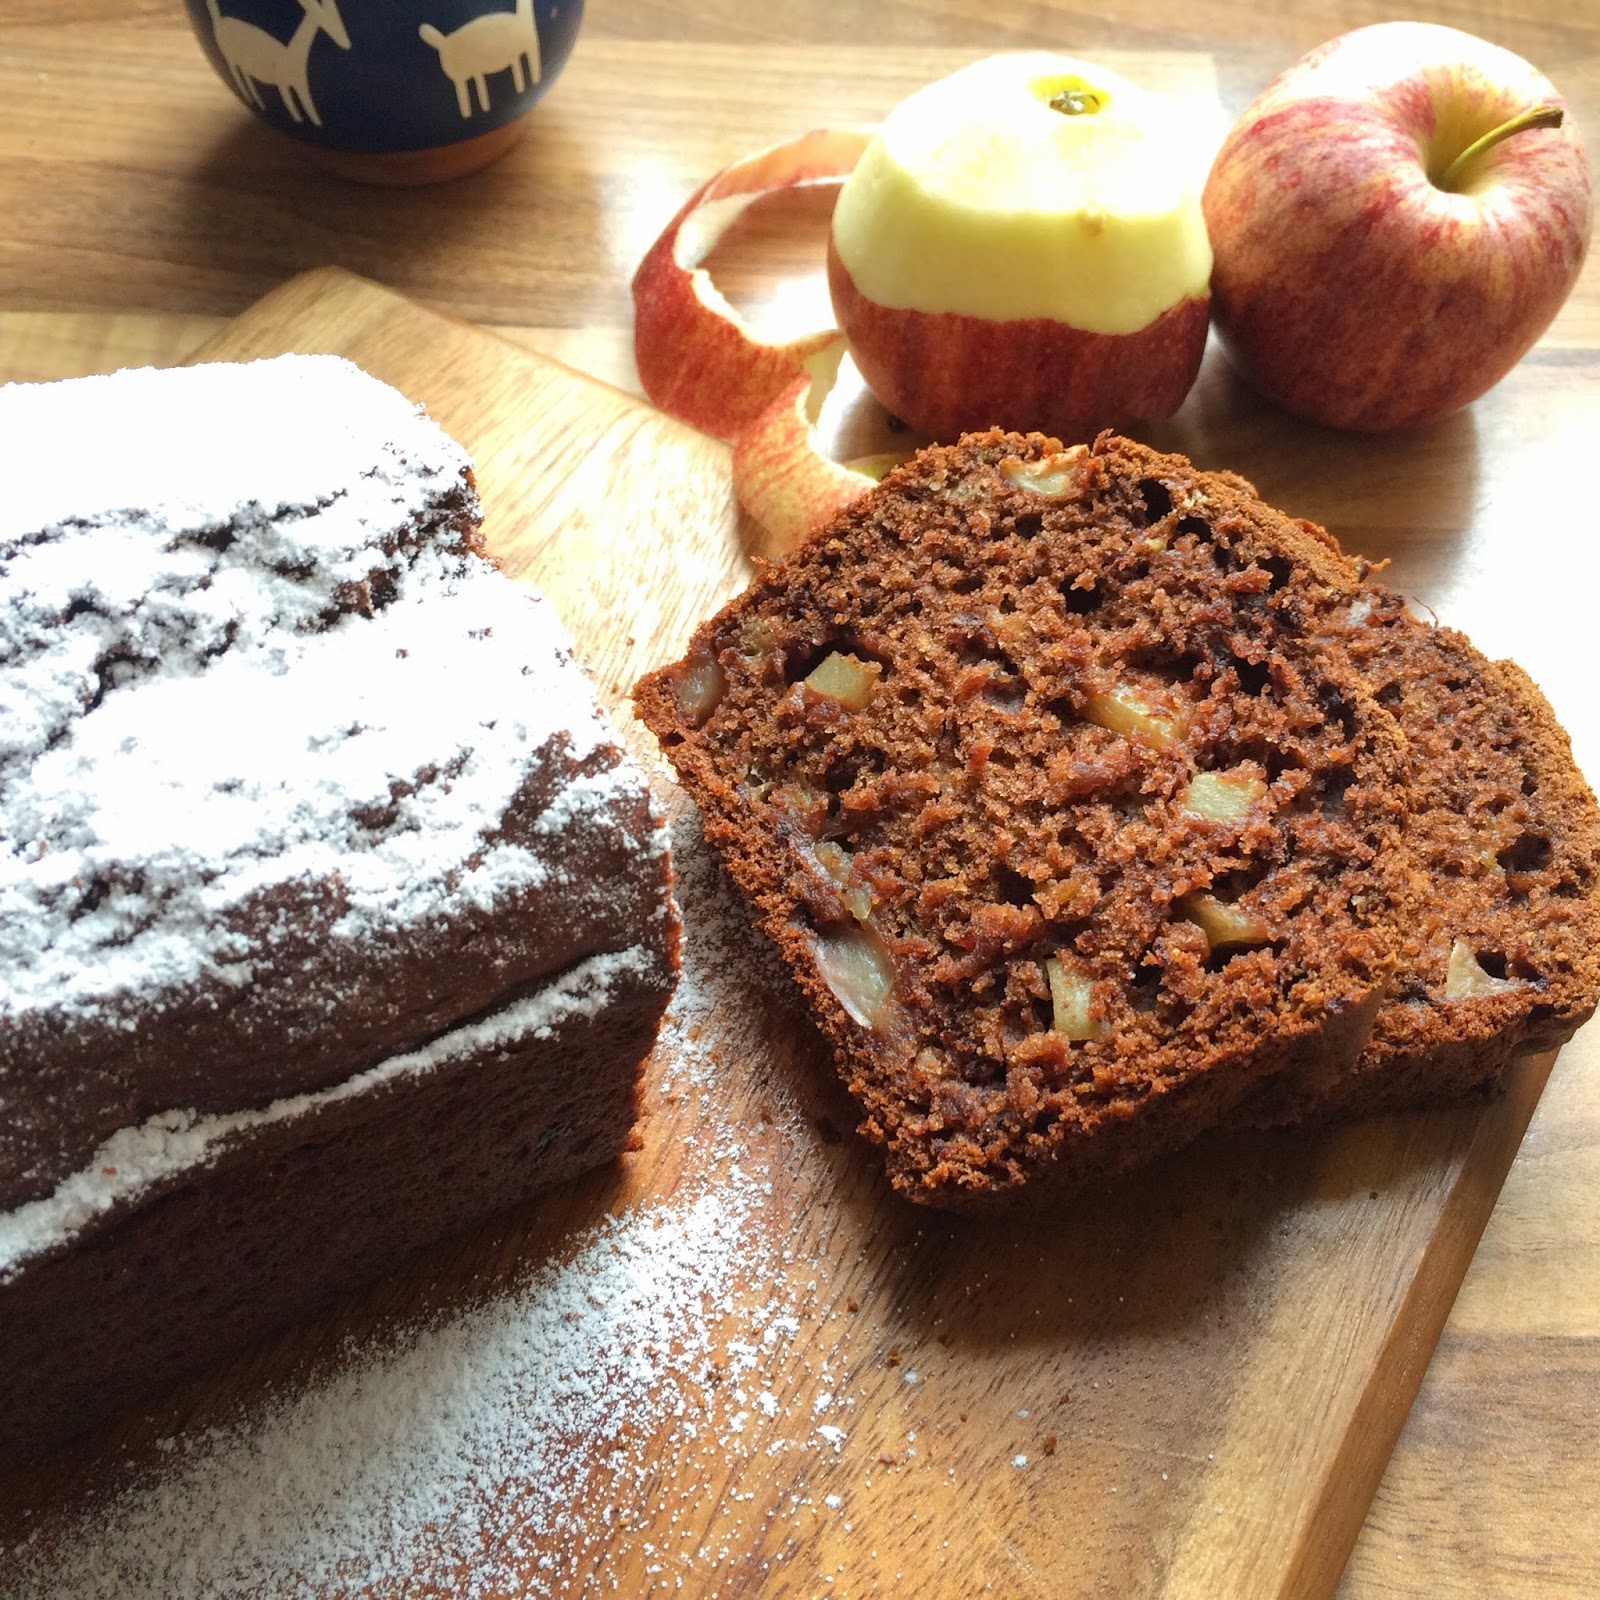 kakaowe ciasto, bananowe ciasto, ptysiu mietowy